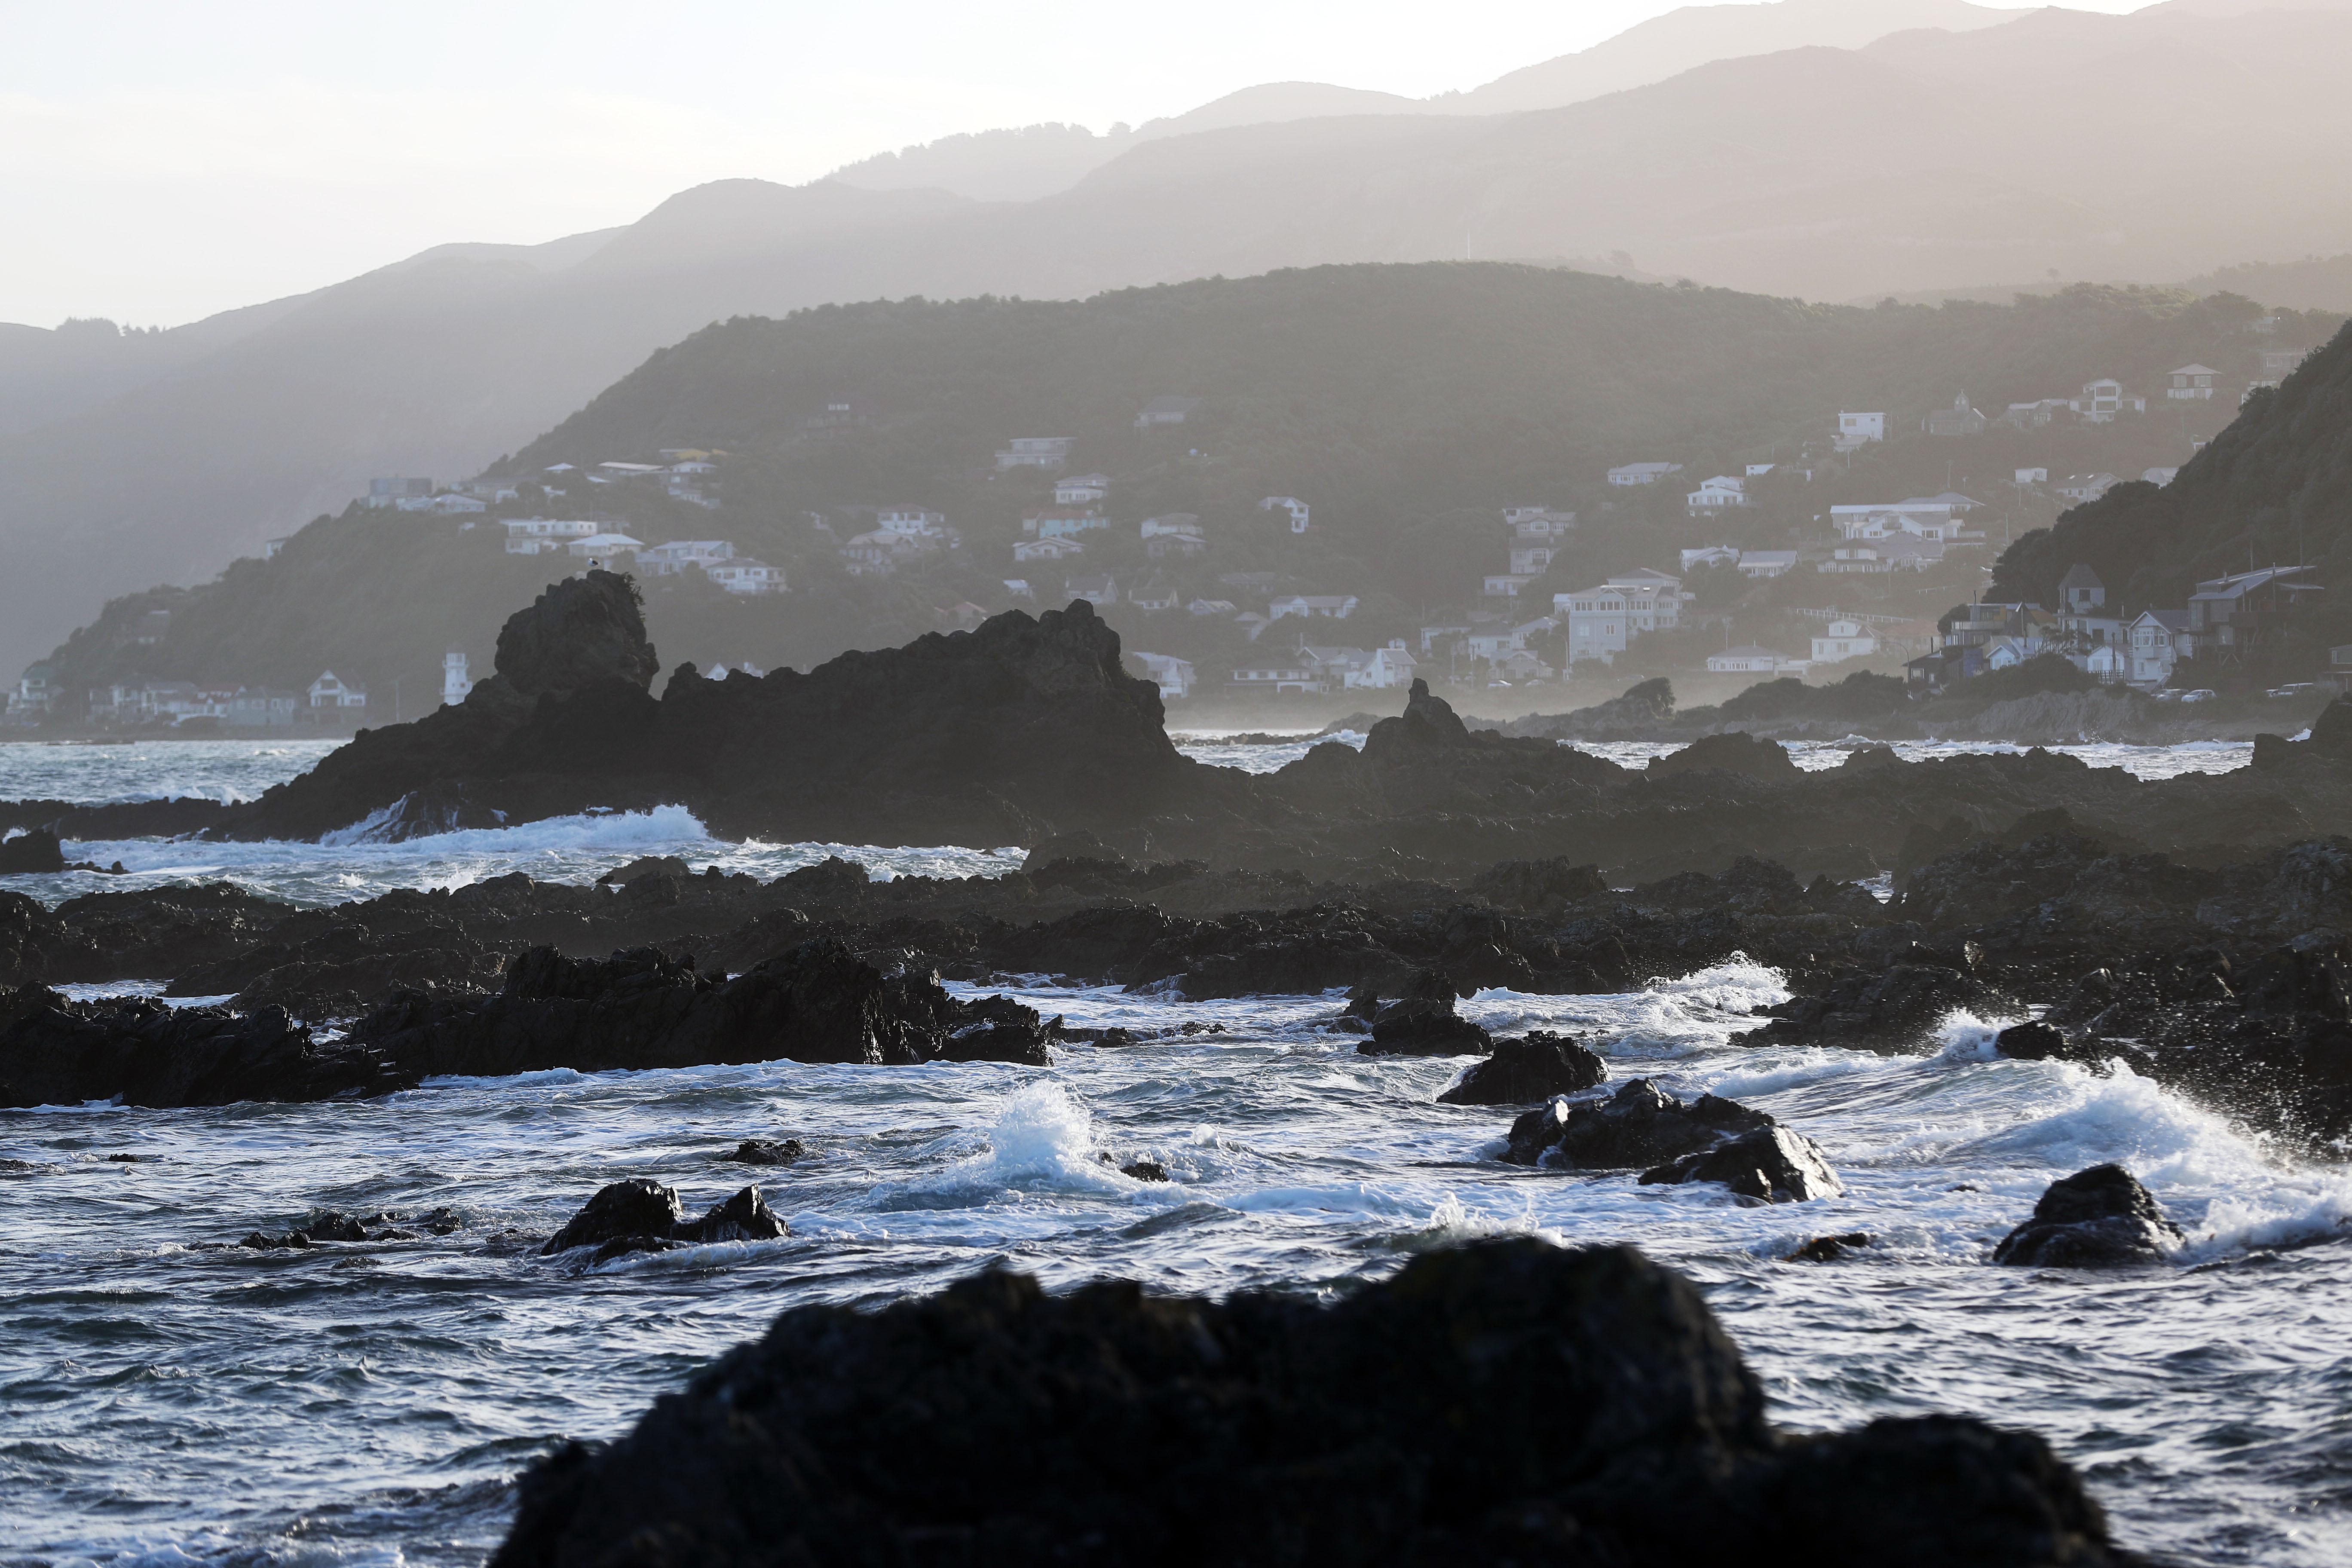 The coast in Wellington, New Zealand, on Sunday, May 19, 2019.